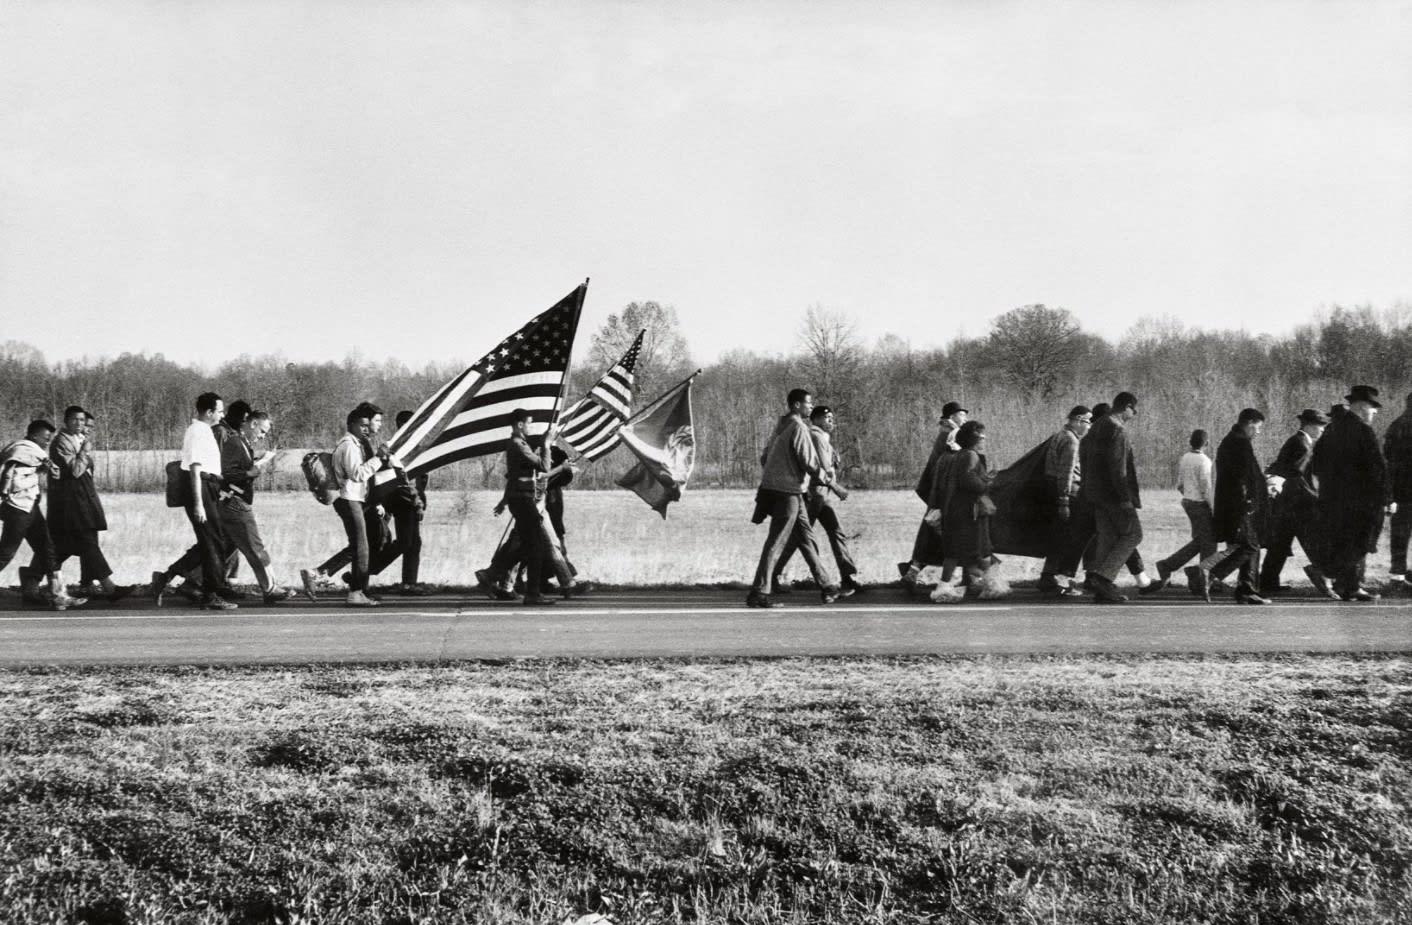 Steve Schapiro On the Road, Selma March, 1965